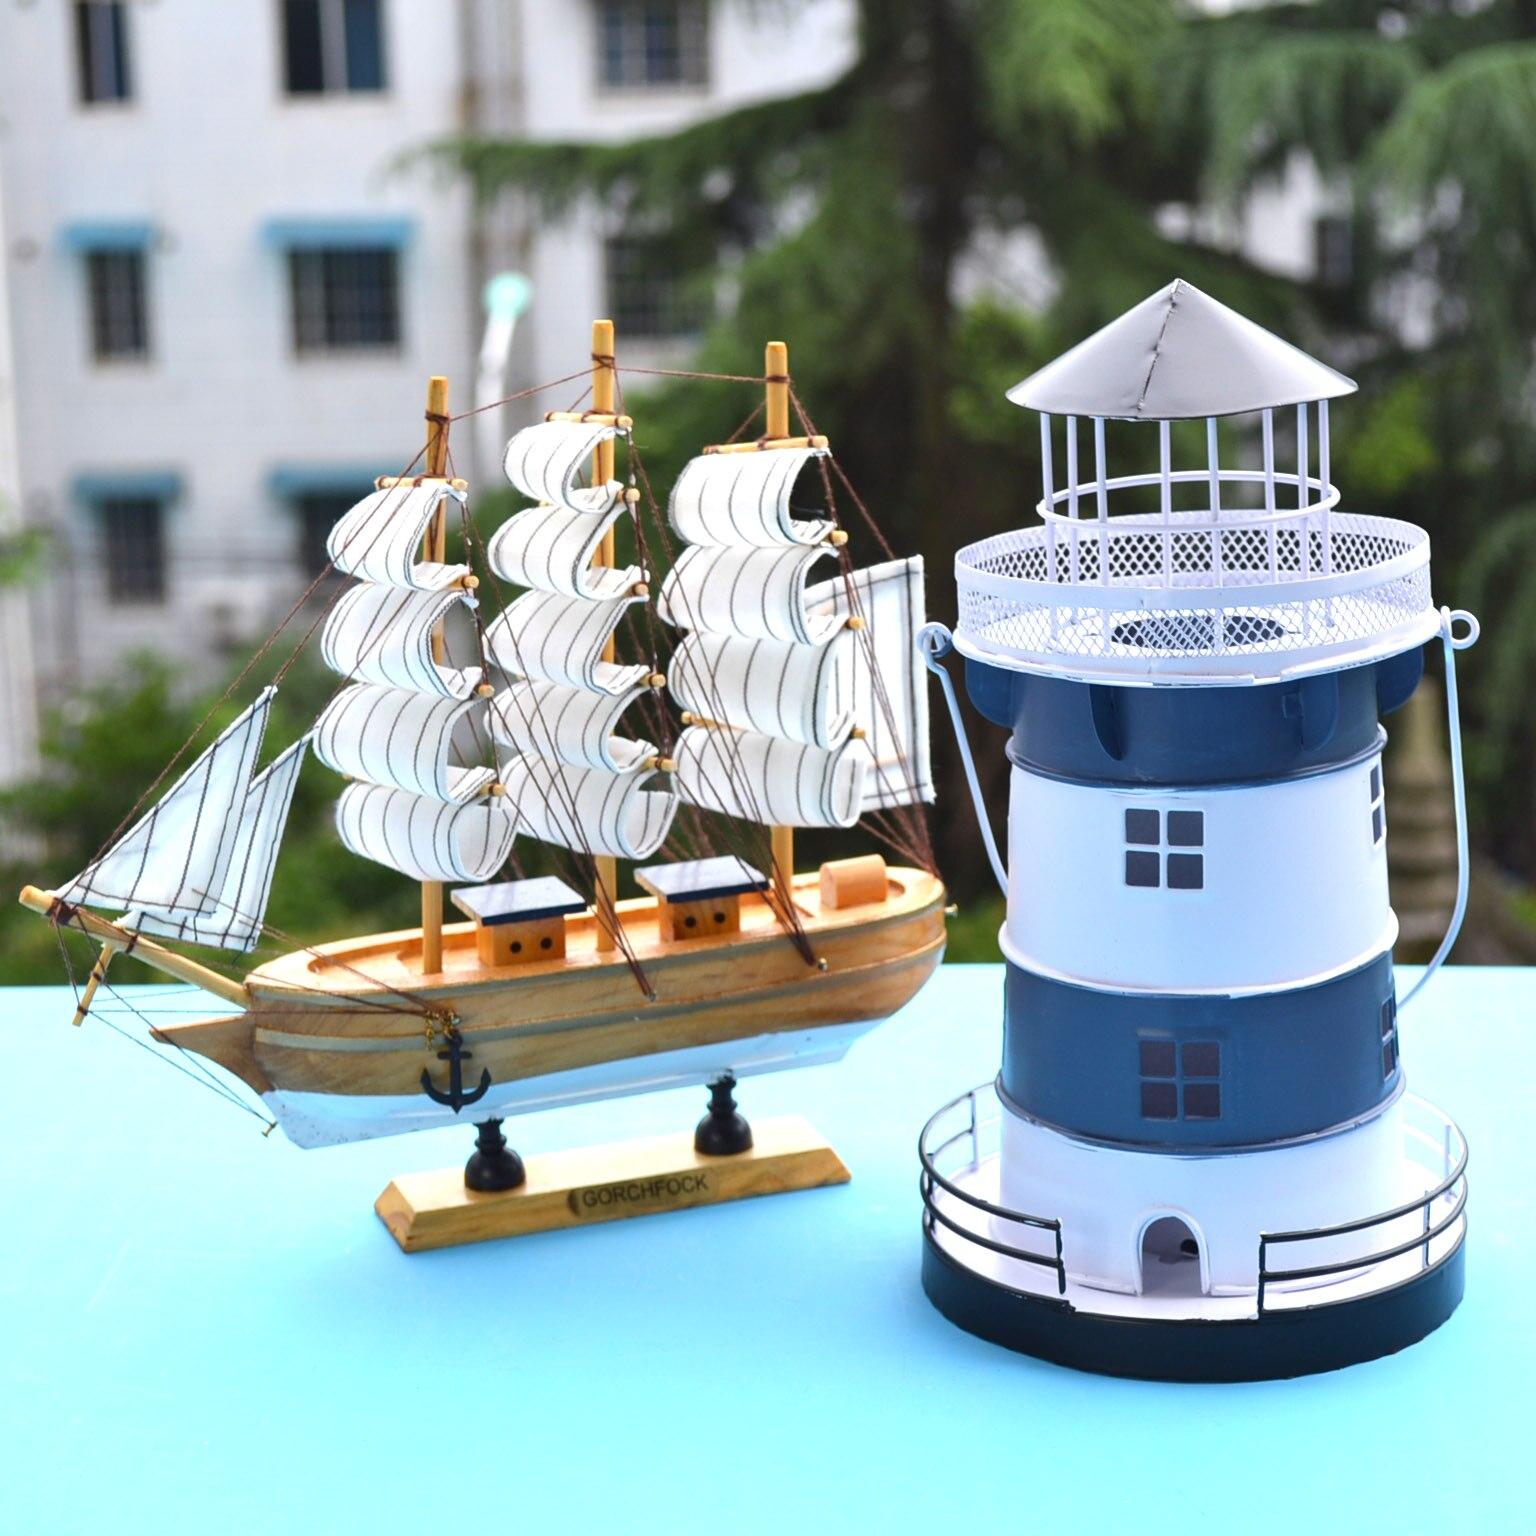 European Mediterranean Creative Lighthouse Candlestick Home Decor Coffee Shop Decorative Wrought Iron Marine Ornaments Iron